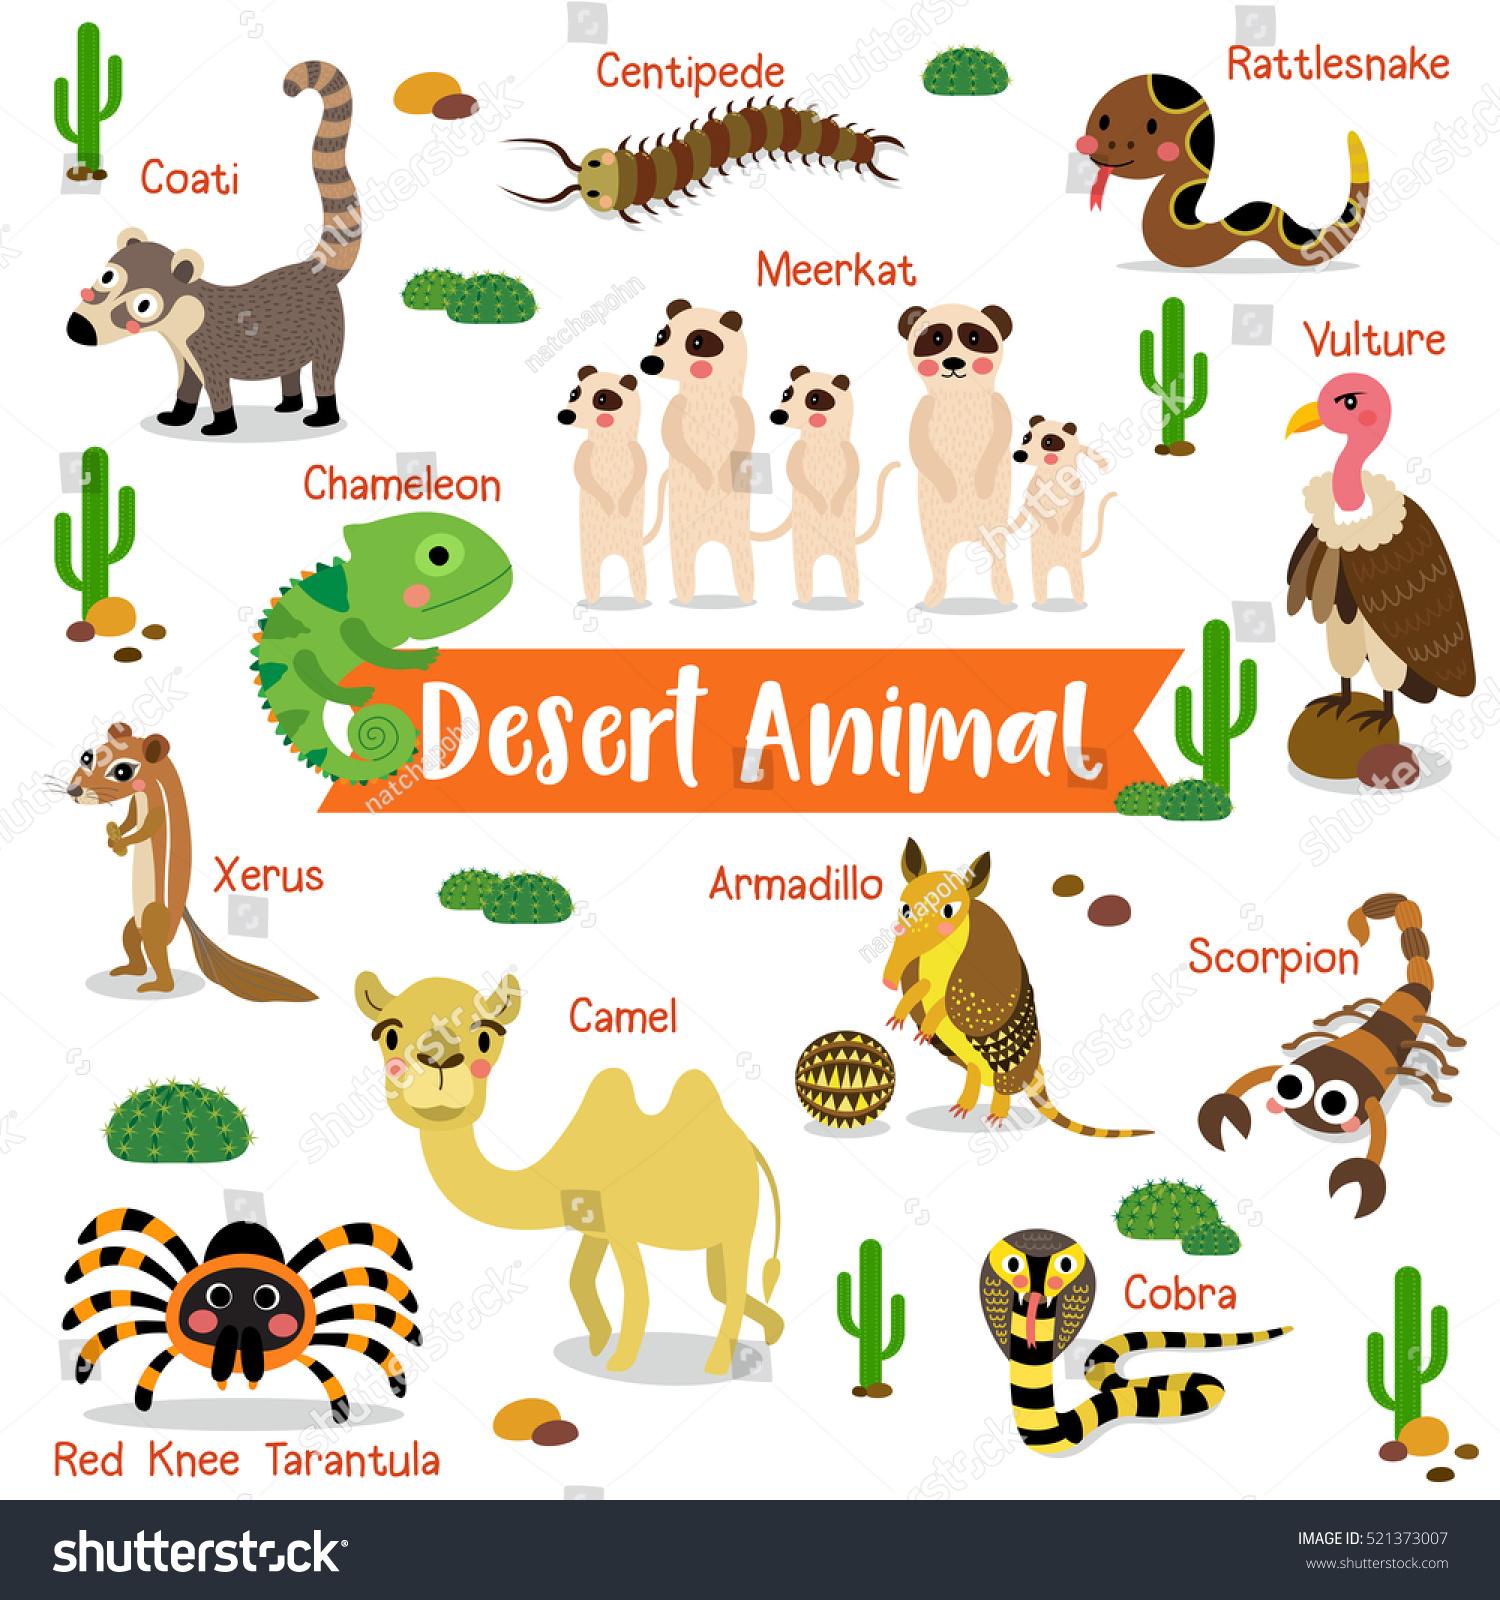 Desert Animals Cartoon On White Background With Animal